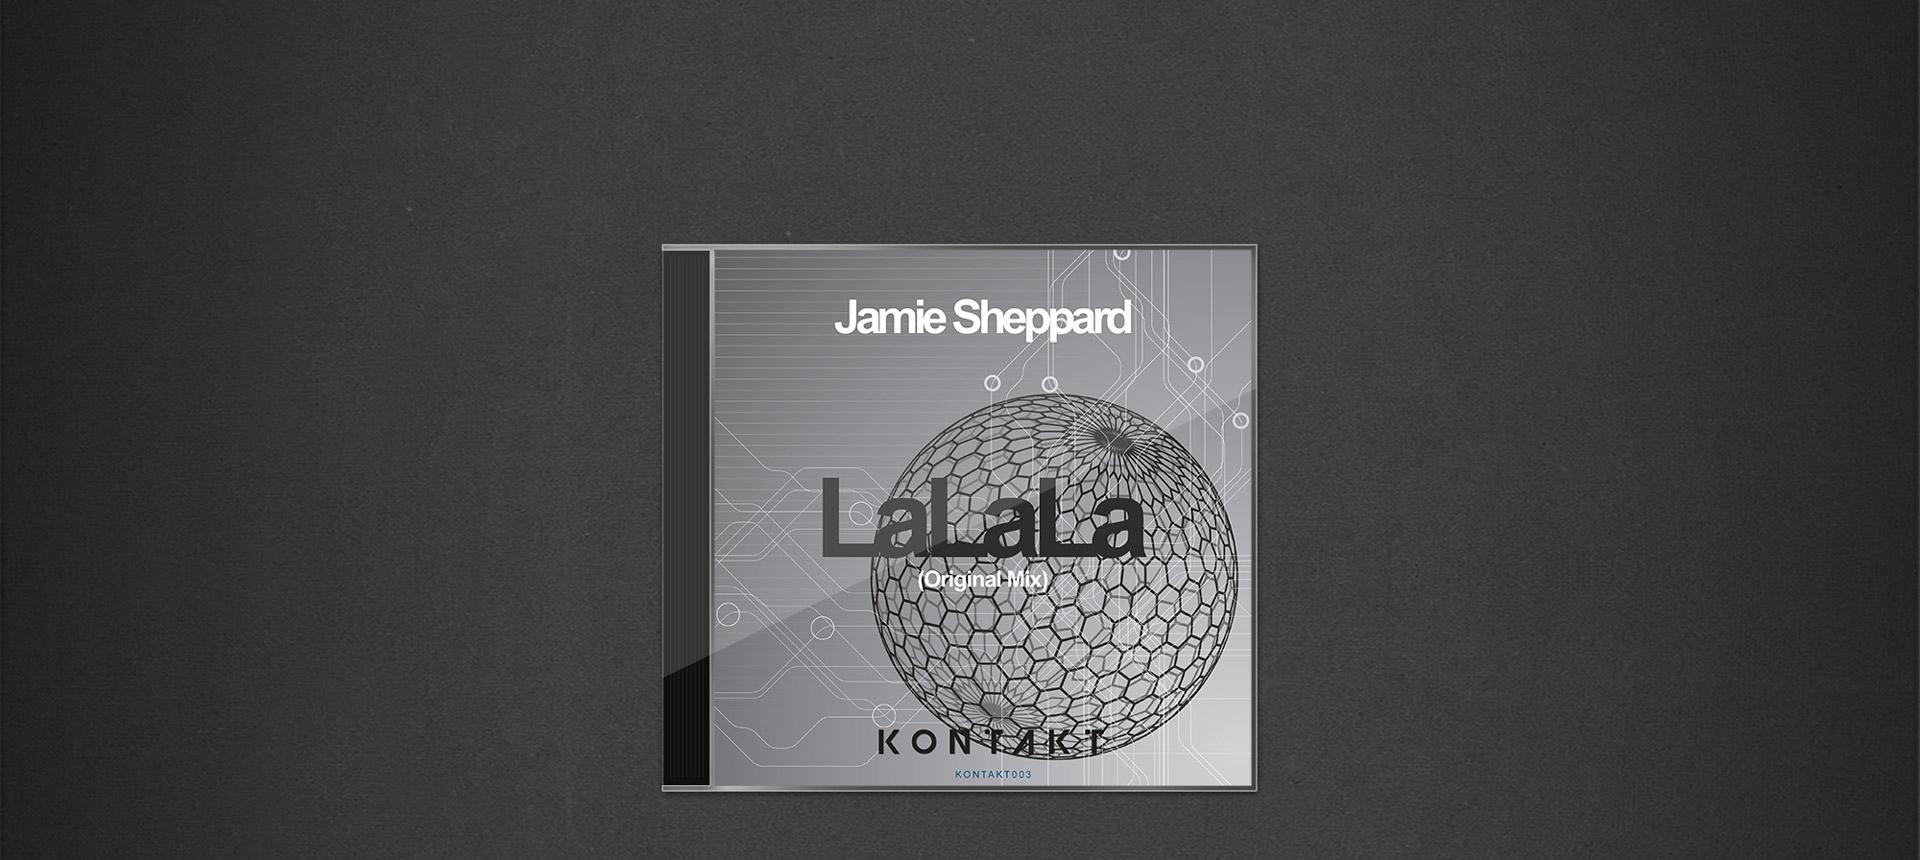 Jamie Sheppard FRZN LaLaLa Remixes